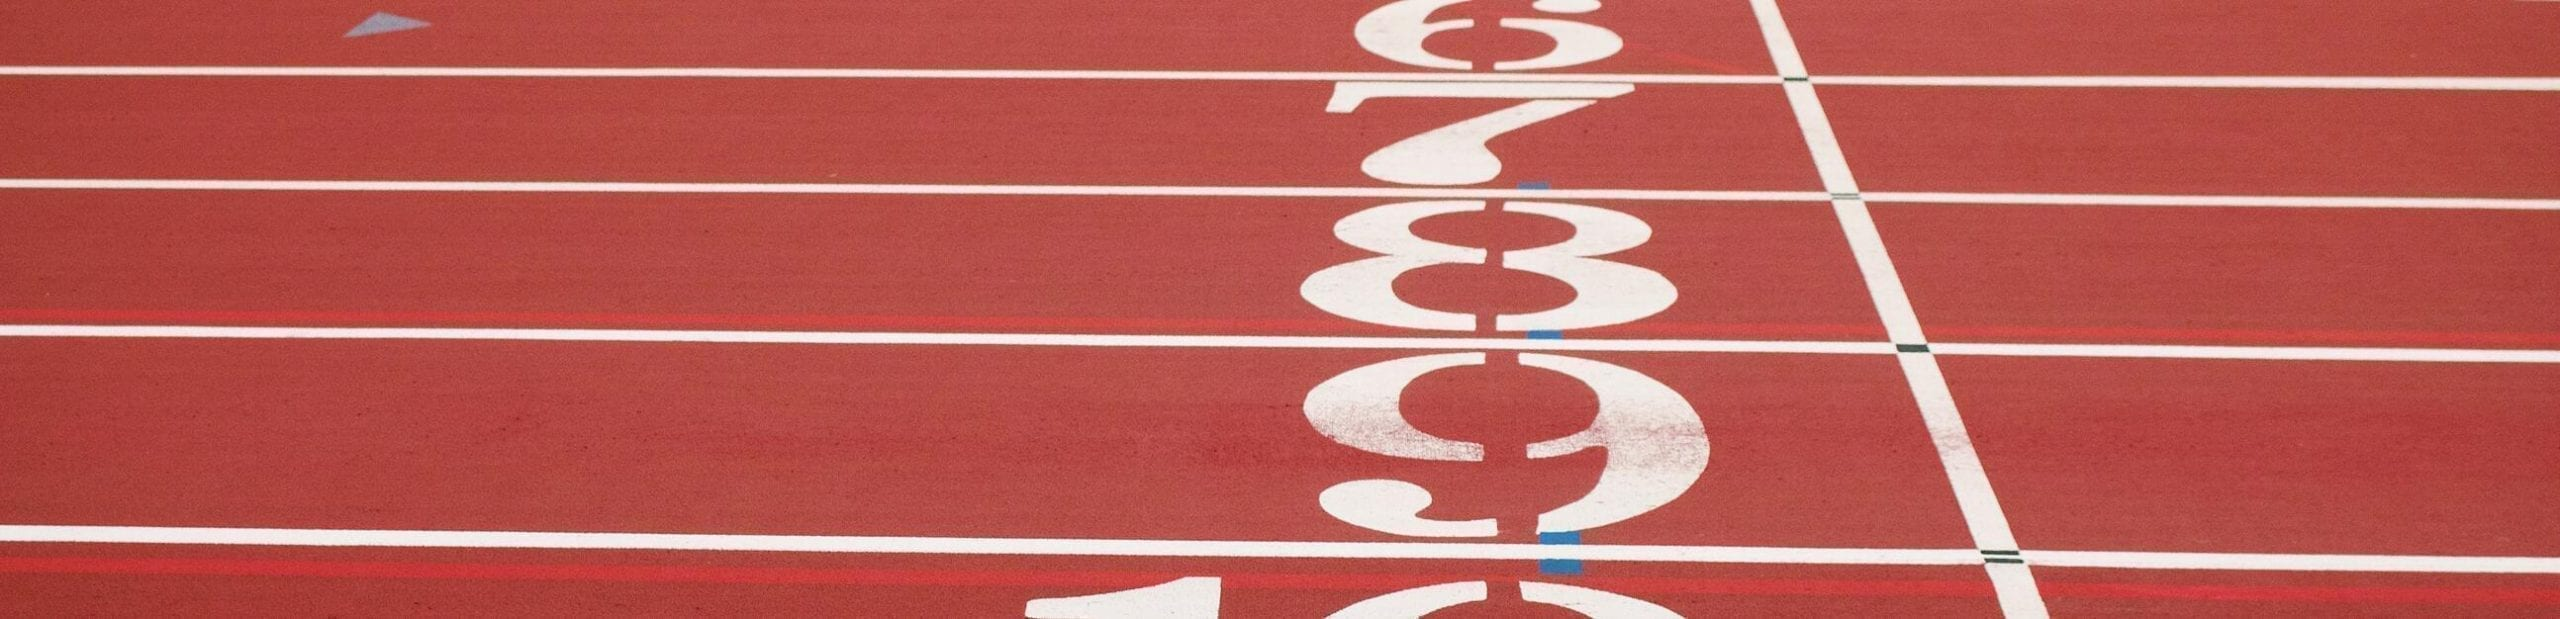 Energy repen en hardlopen